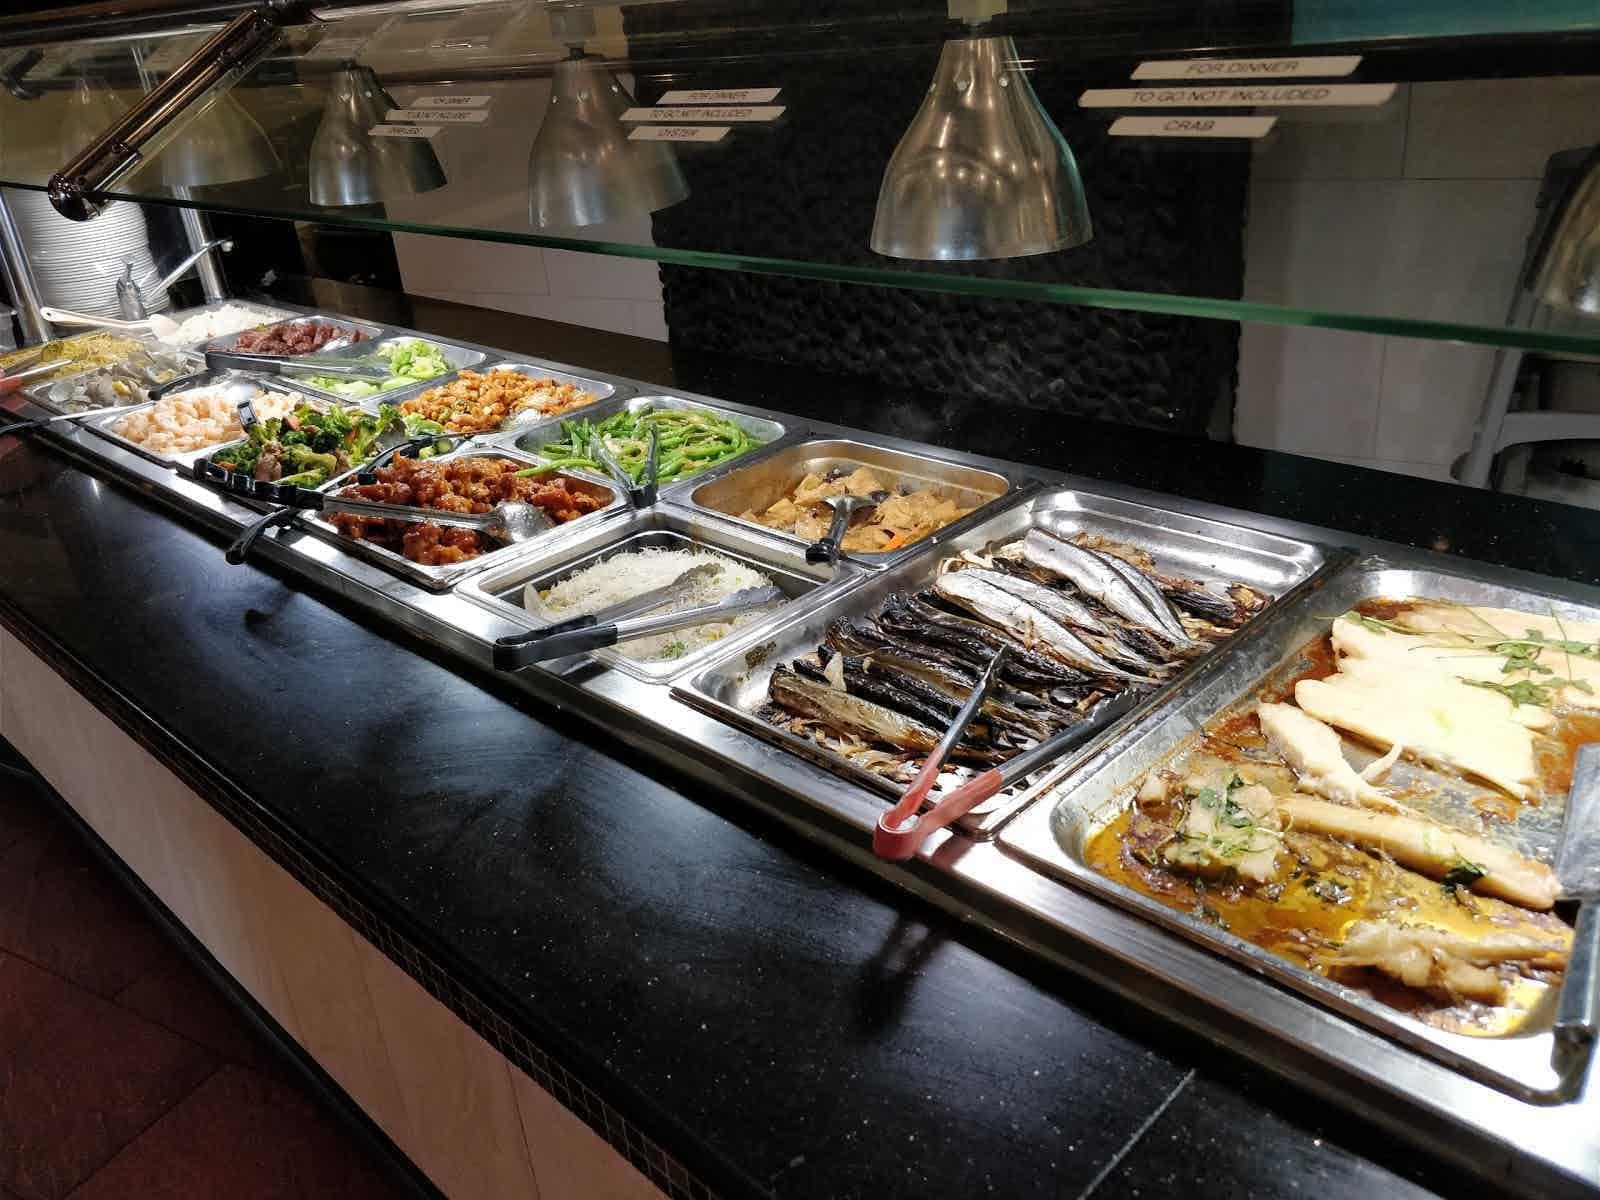 Wondrous Buffet Star Redlands Restaurant Review Zagat Download Free Architecture Designs Intelgarnamadebymaigaardcom